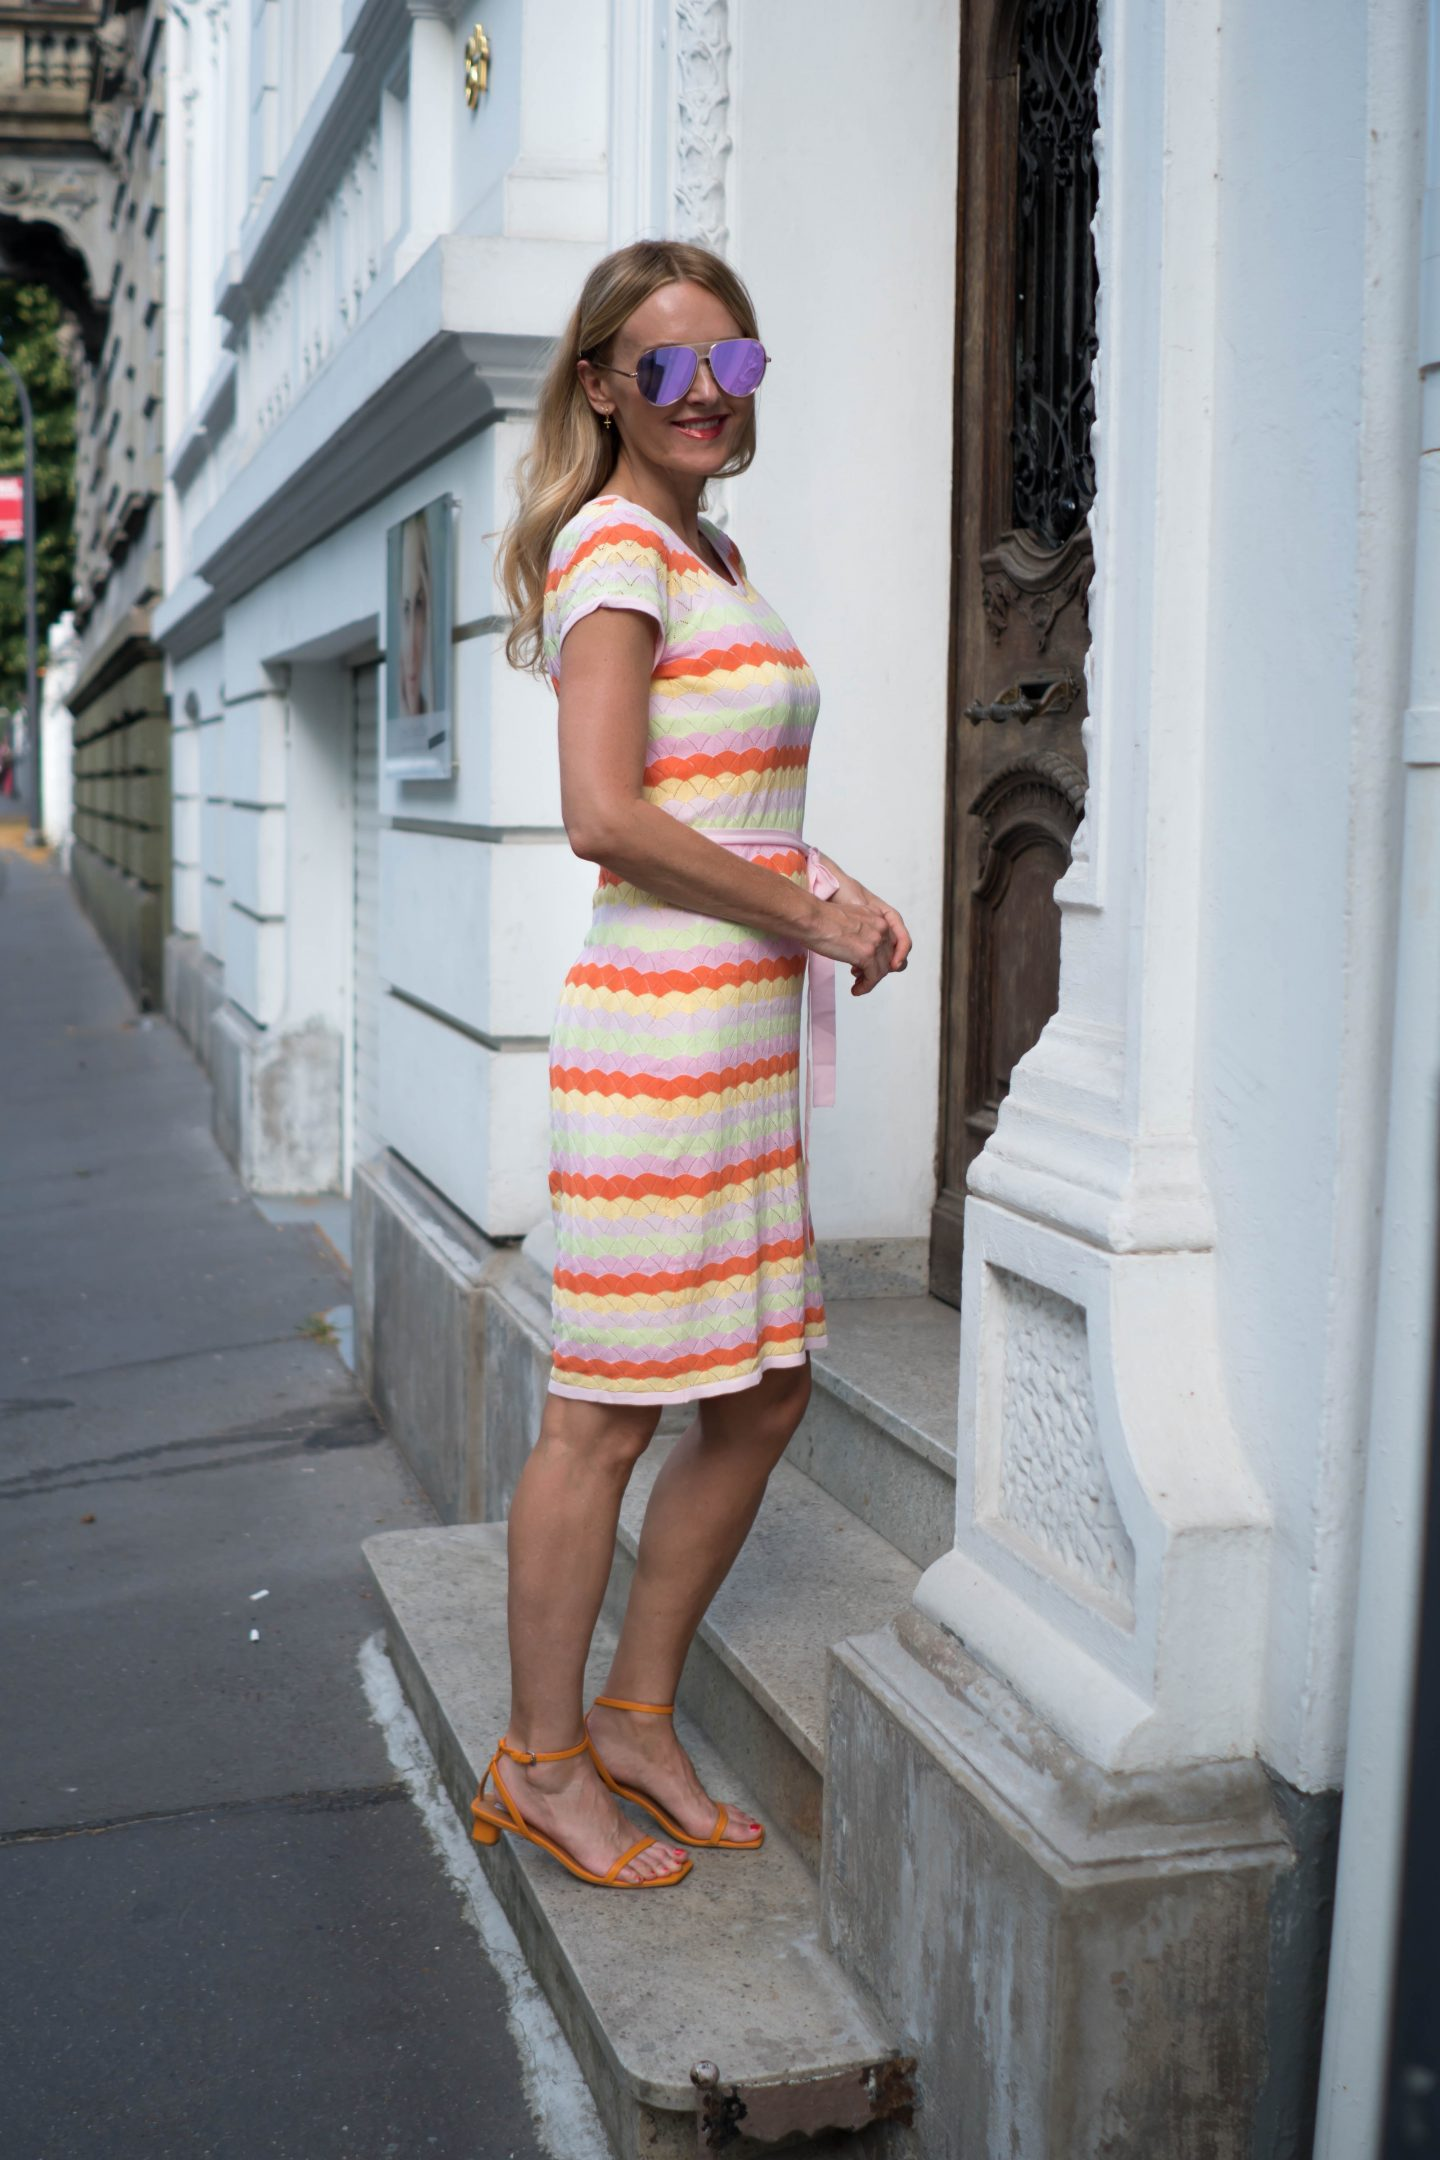 Nowshine Fashionblog ü 40